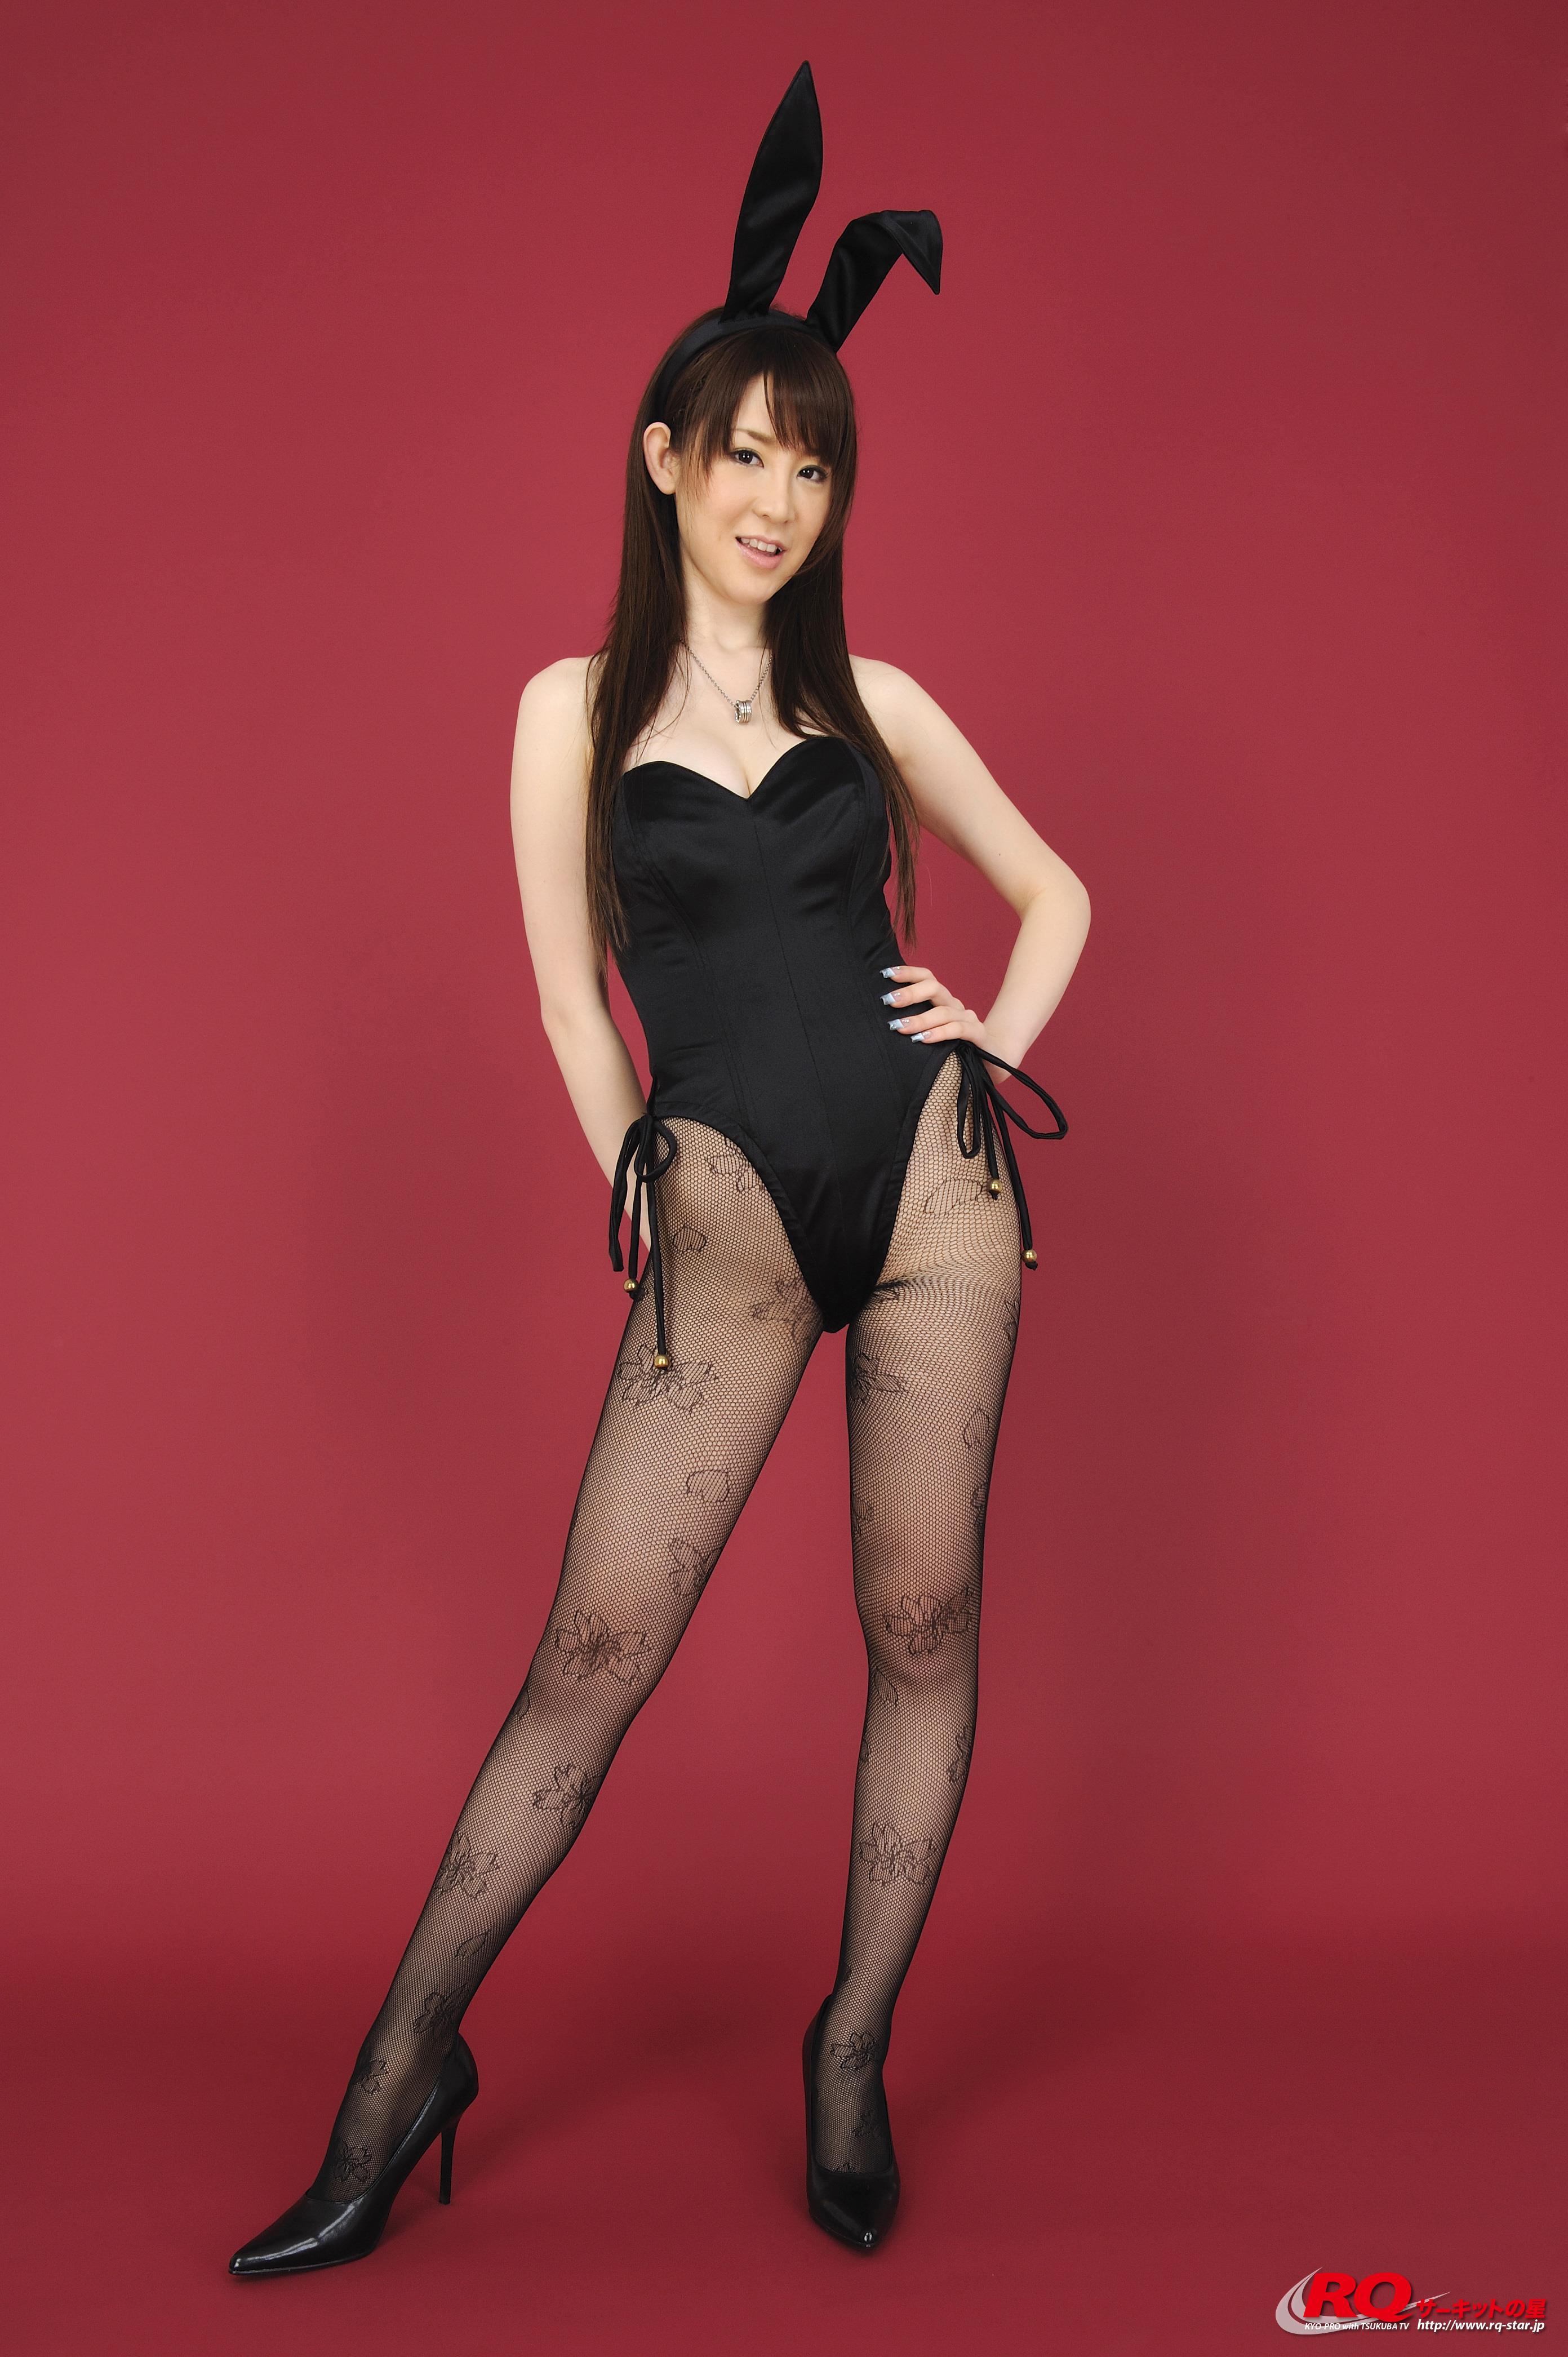 [RQ-STAR写真]NO.00125 Yuko Nakamura 中村优子 黑色性感兔女郎制服内衣与黑色丝袜美腿私房写真集